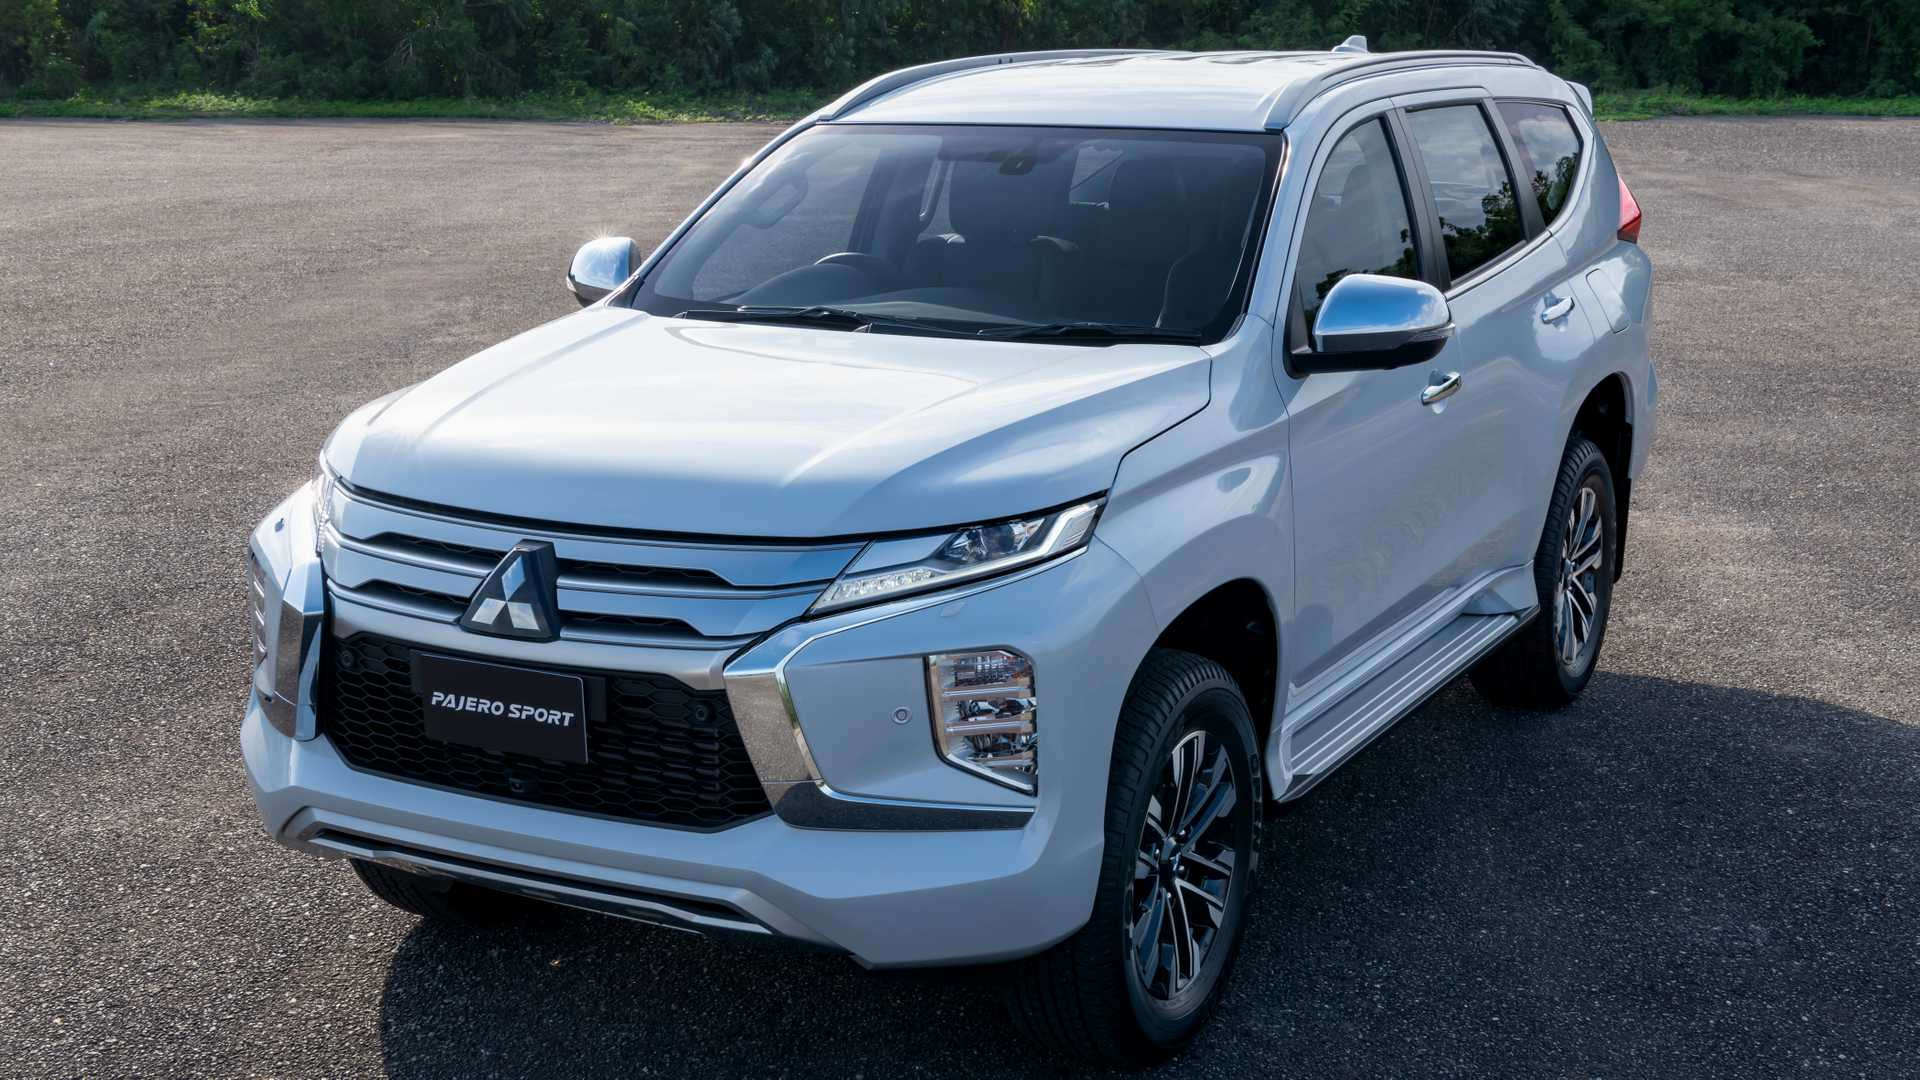 2020_Mitsubishi_Pajero_Sport_facelift_0005